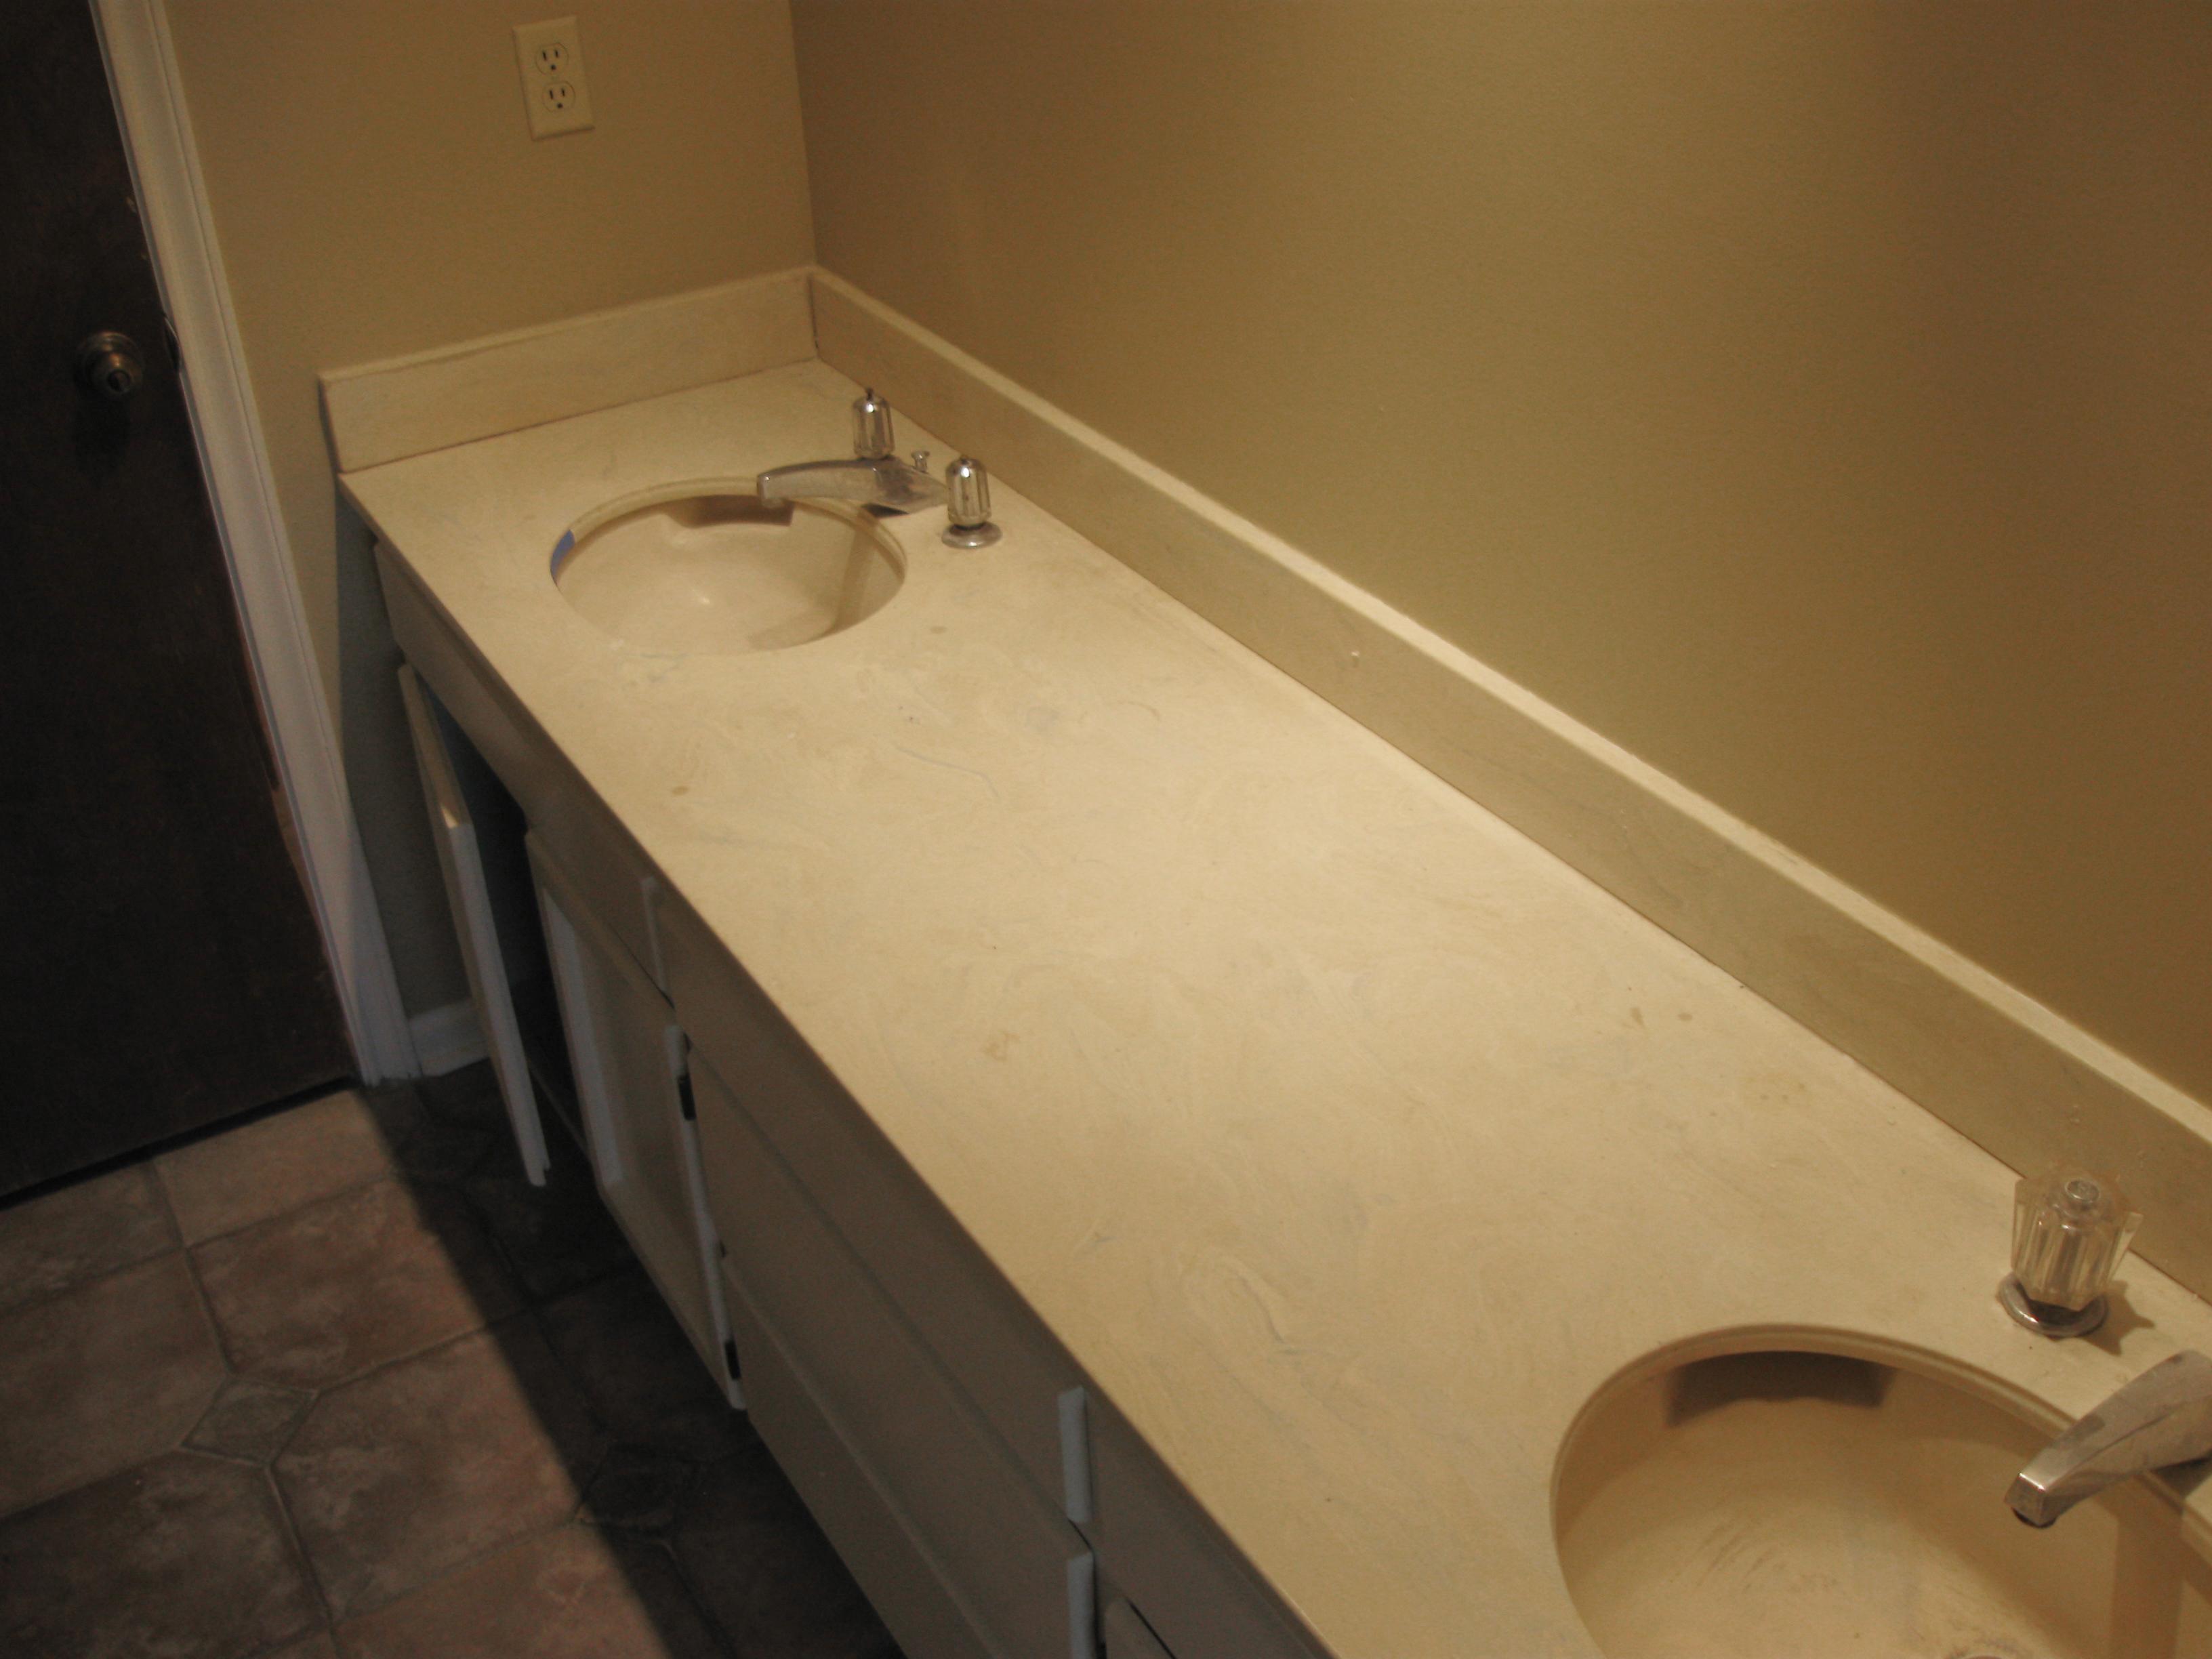 part bath bathtub restoration s tub tubs toronto claw foot ont dirty refinishing